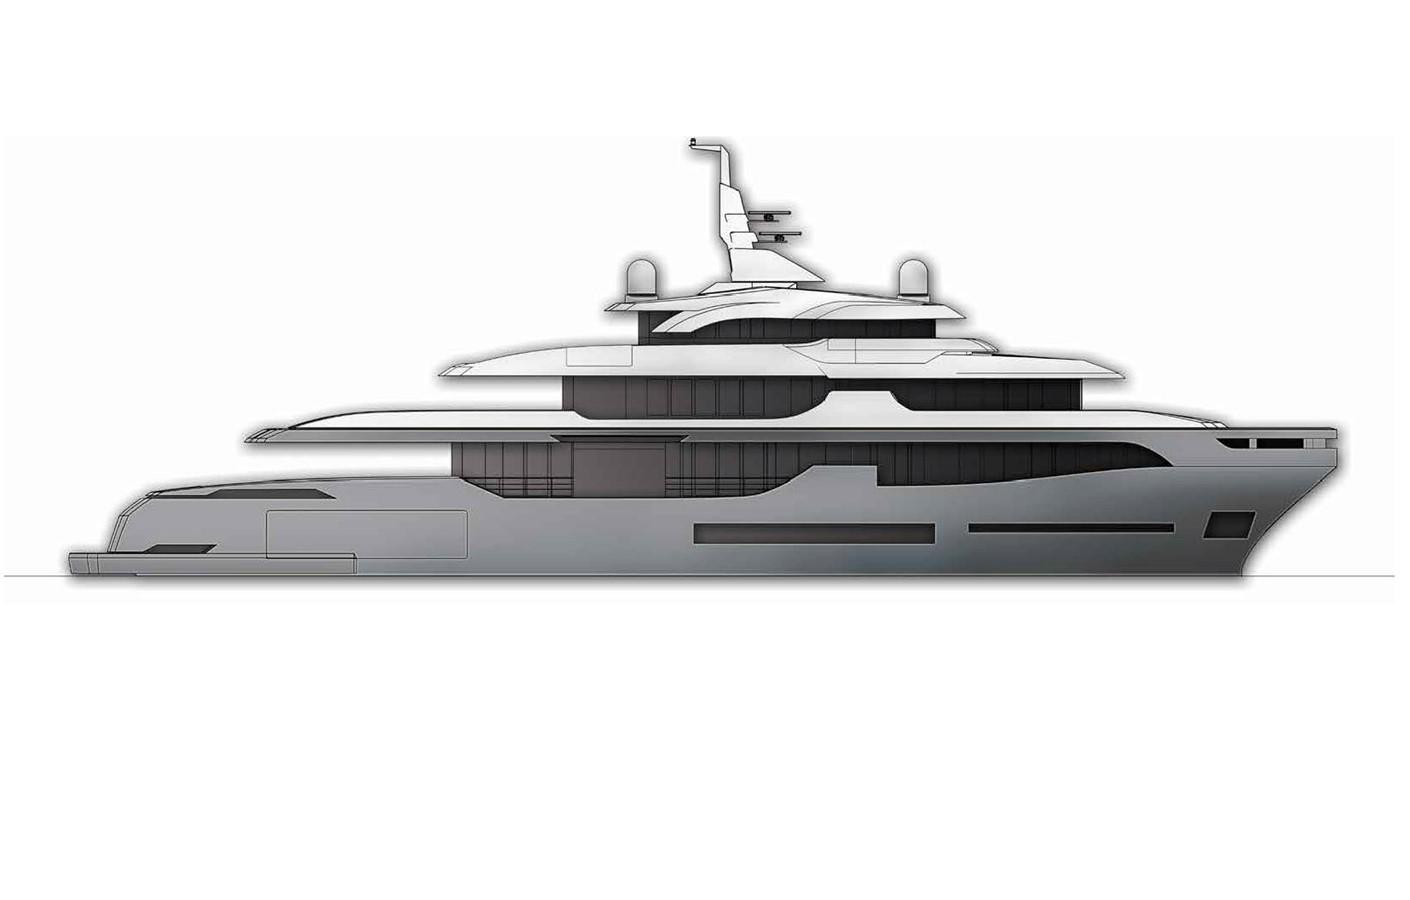 2021 RMK MARINE SHIPYARDS, TURKEY Expedition  Motor Yacht 2285925